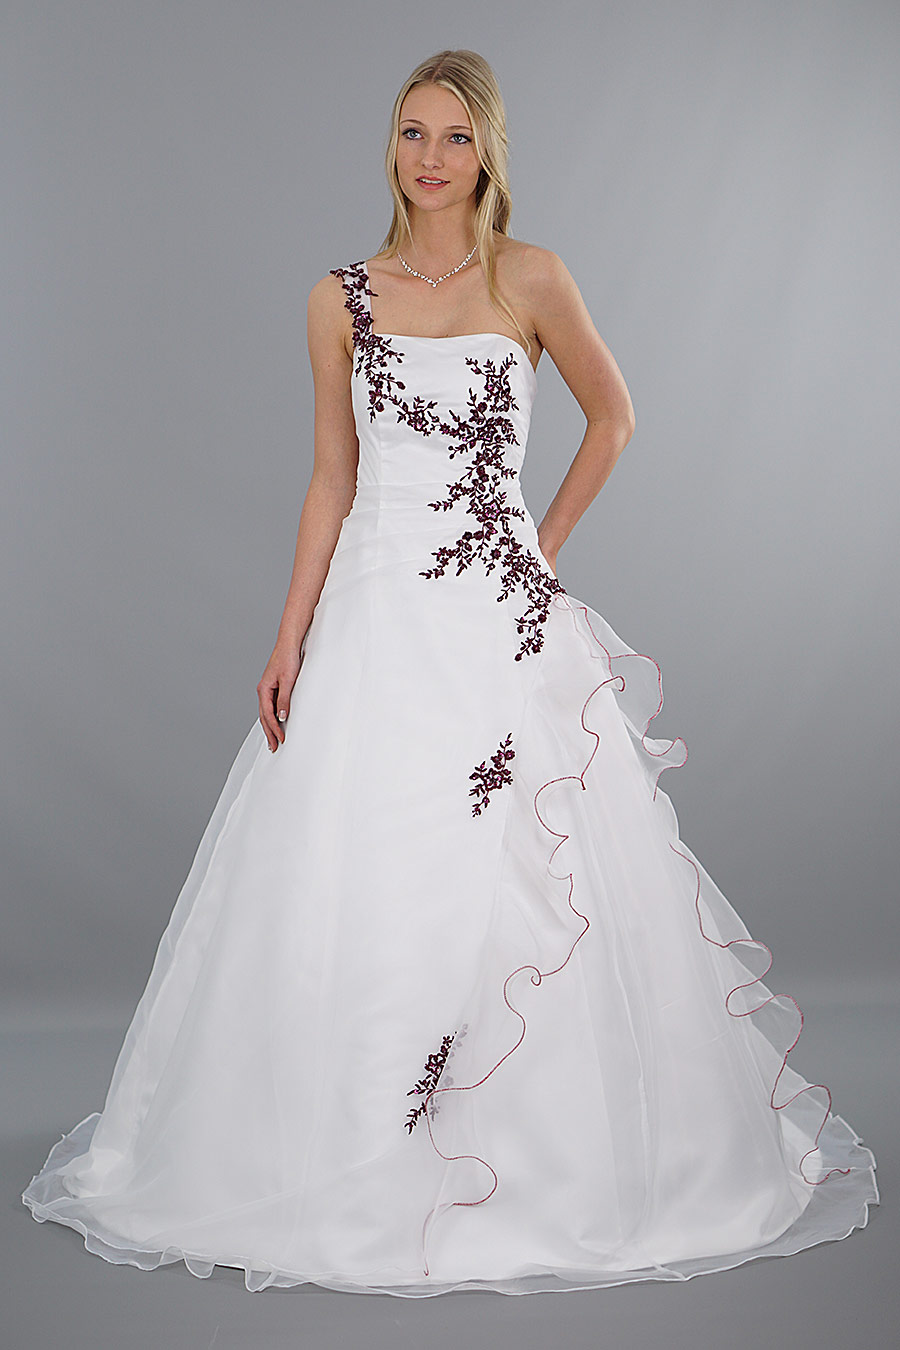 Brautkleid Modell Lilly - rot bestickt   Schmetterling ...